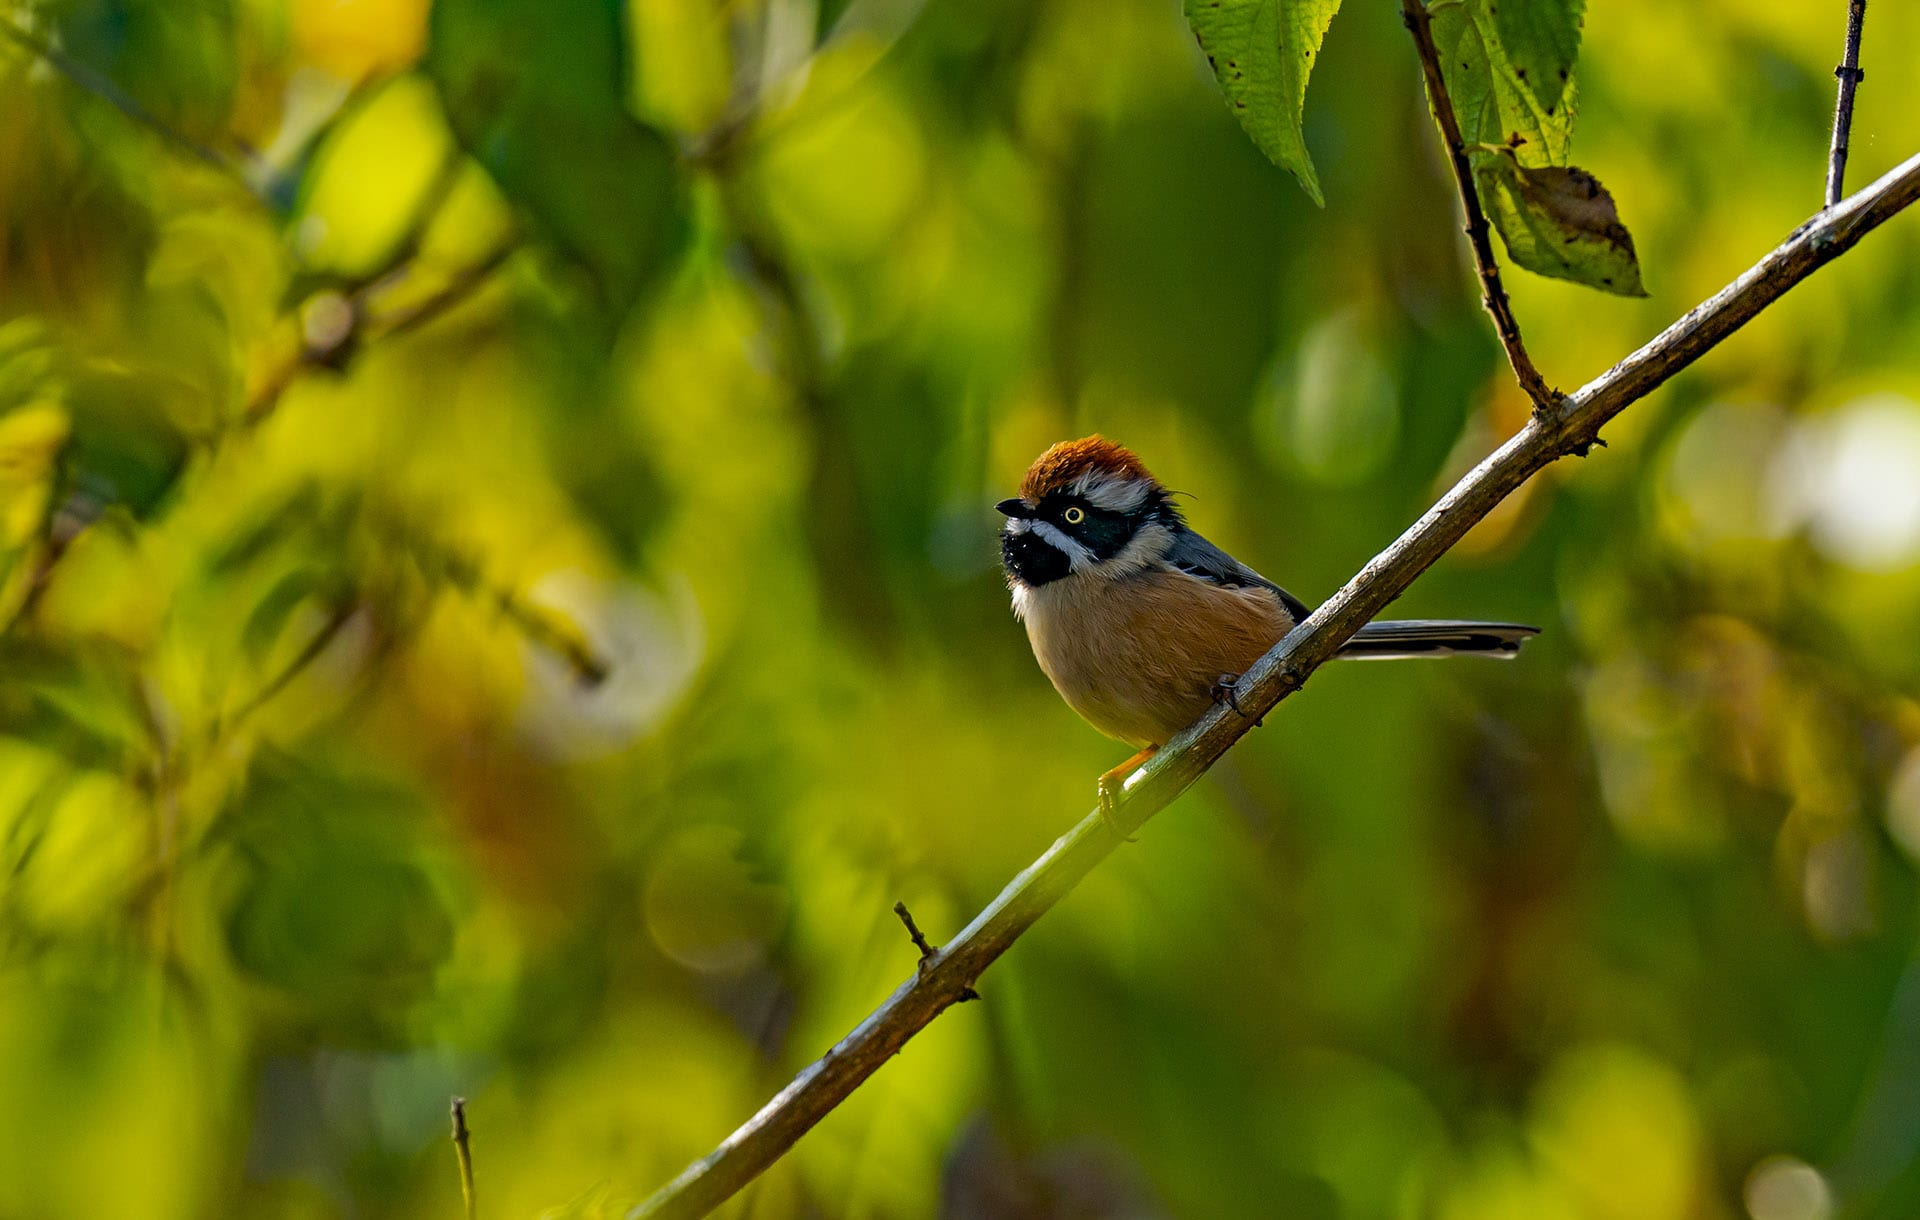 uttarakhand-kedarnath-wls-black-throated-tit-sitting-on-a-tree-branch